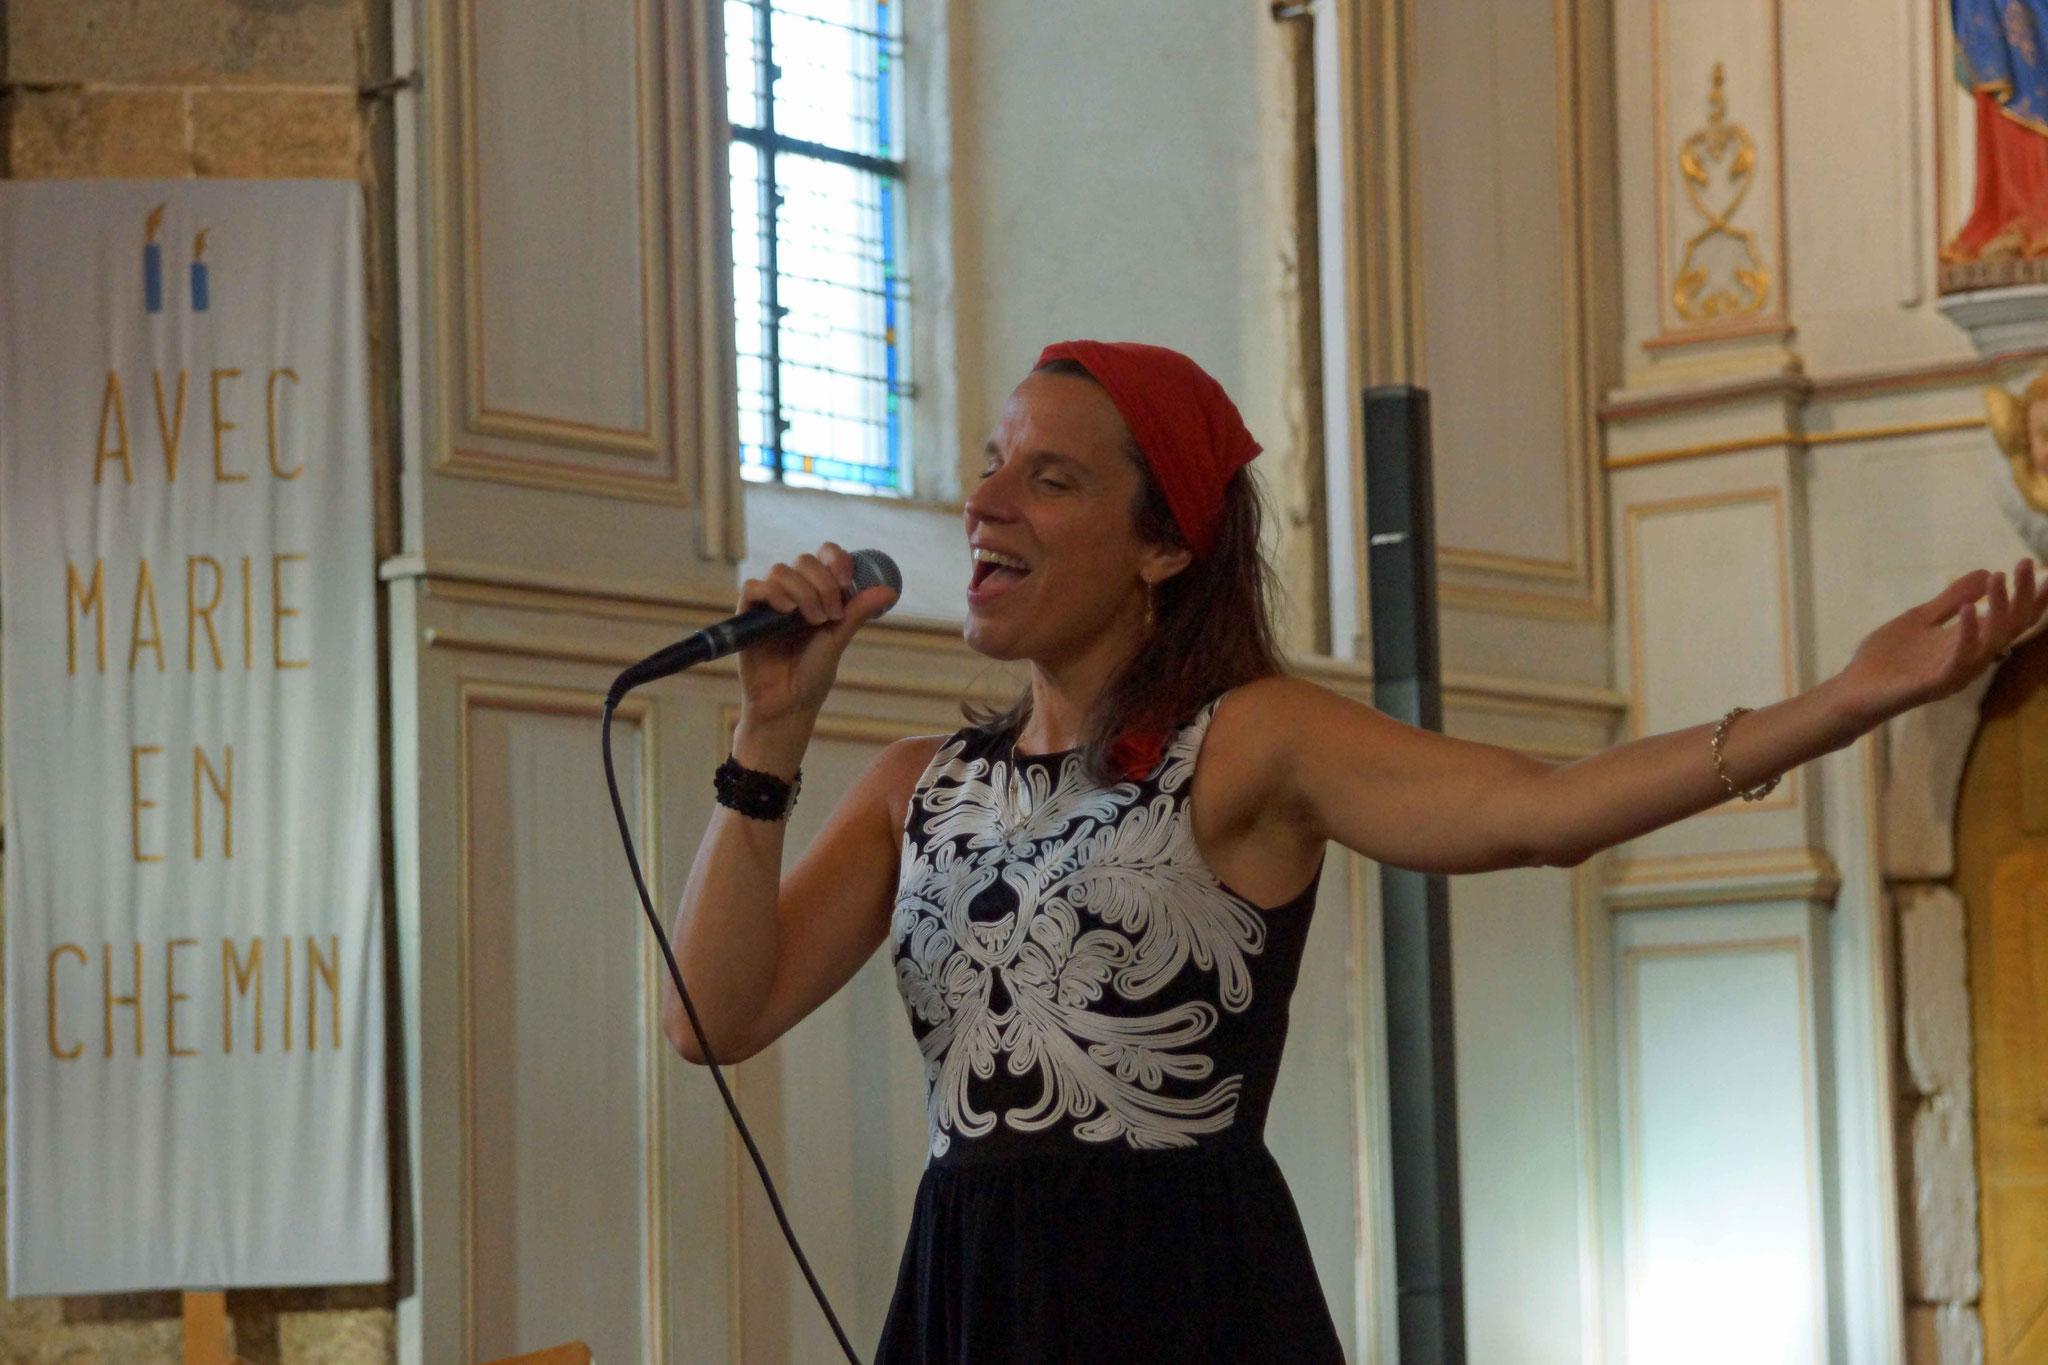 Concert de Liscorno, Lannebert Dimanche 9 Octobre ~ 4